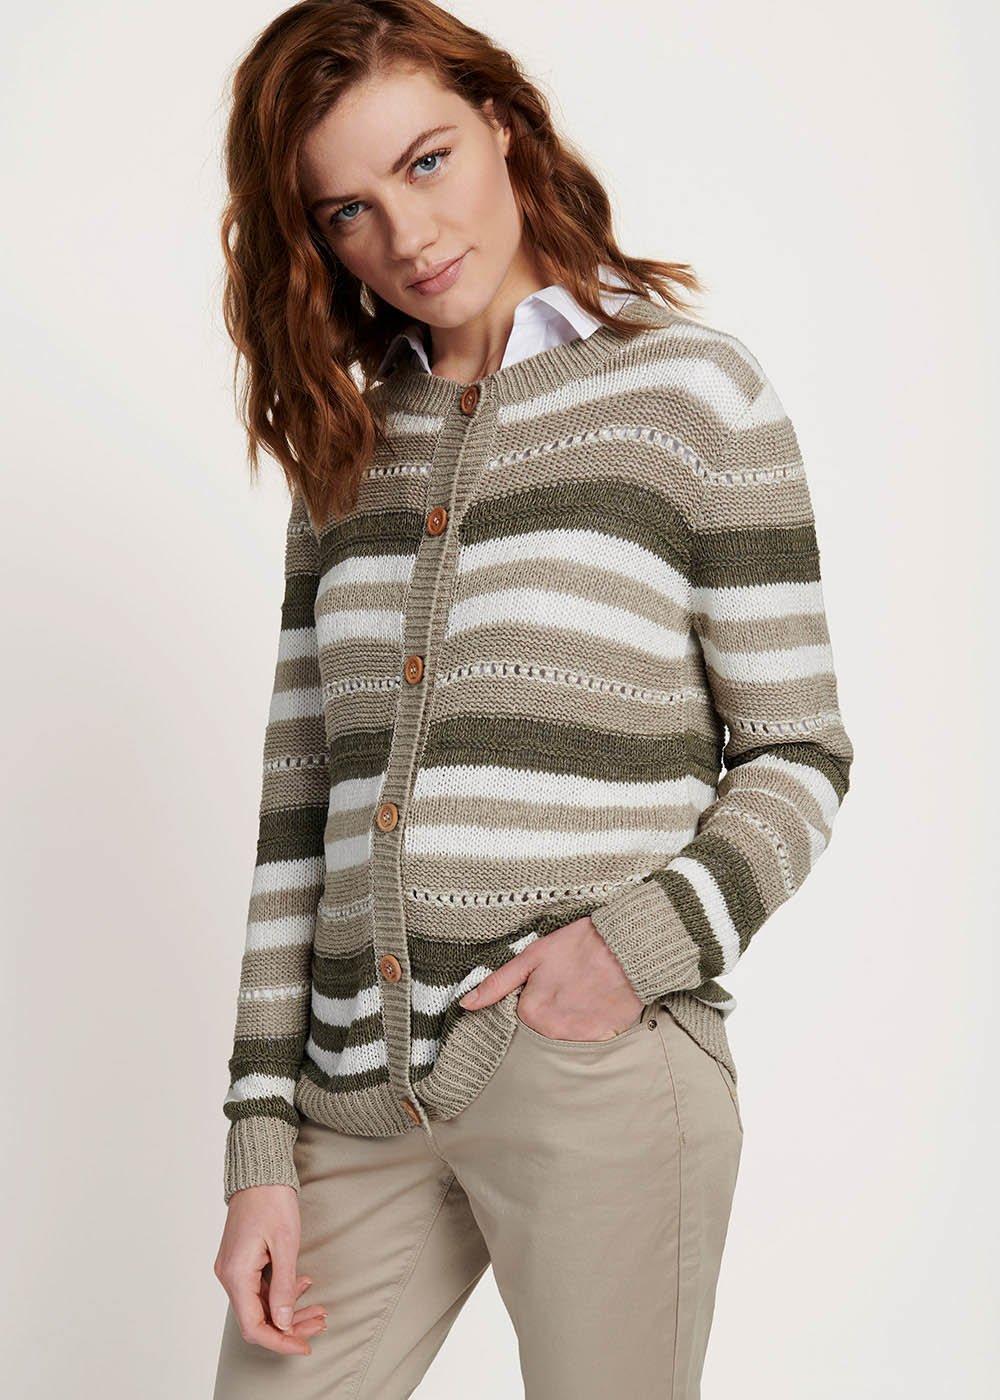 Clair cardigan with multicolour stripes - Timo / Tofu / Stripes - Woman